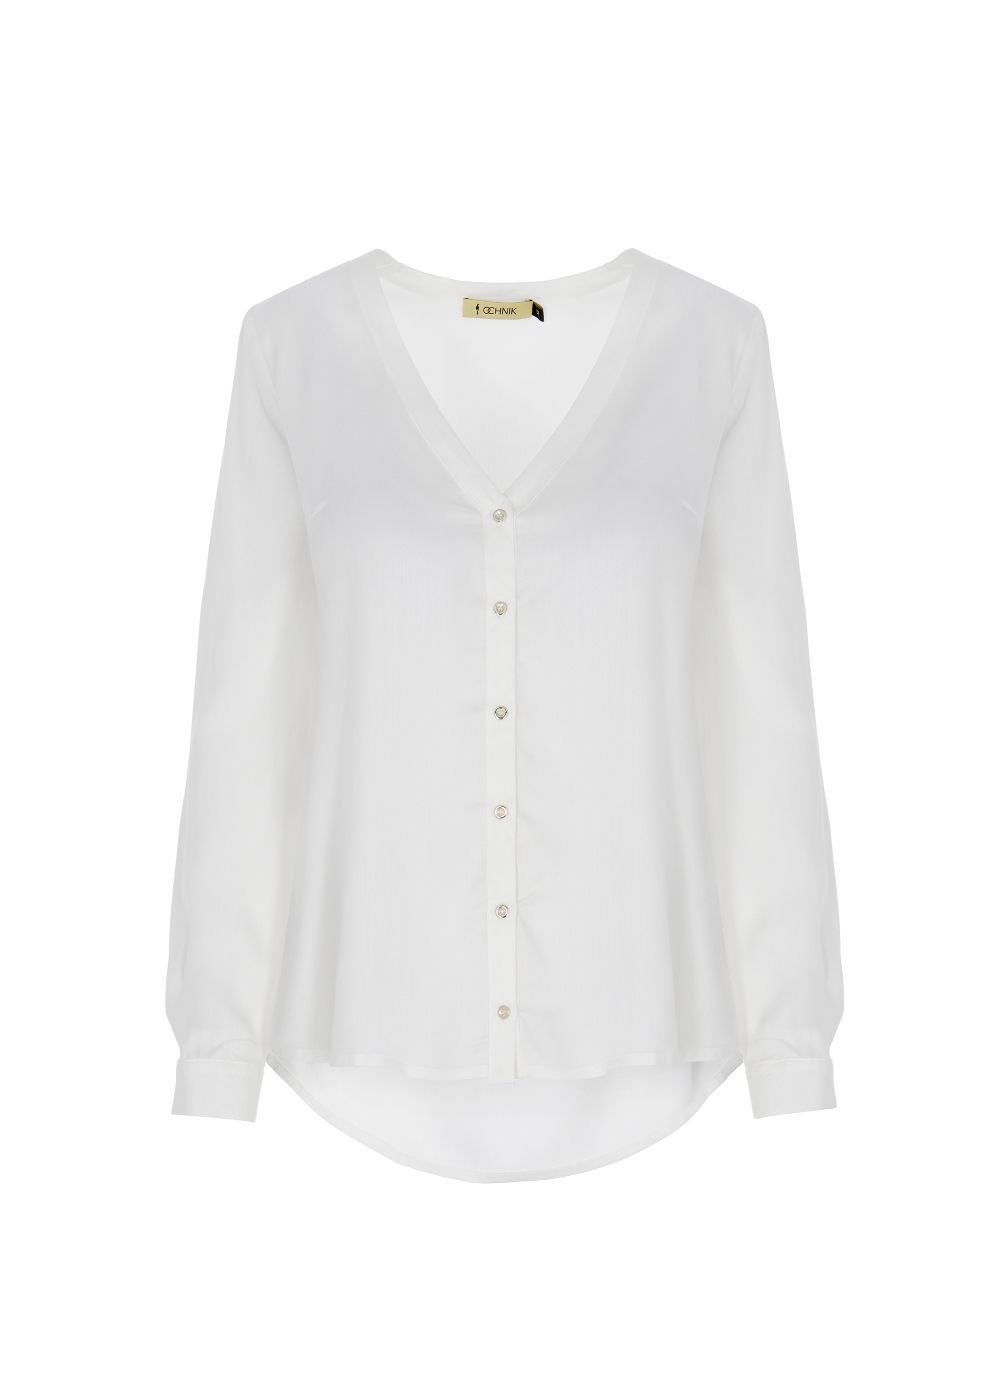 Koszula damska KOSDT-0068-11(Z19)